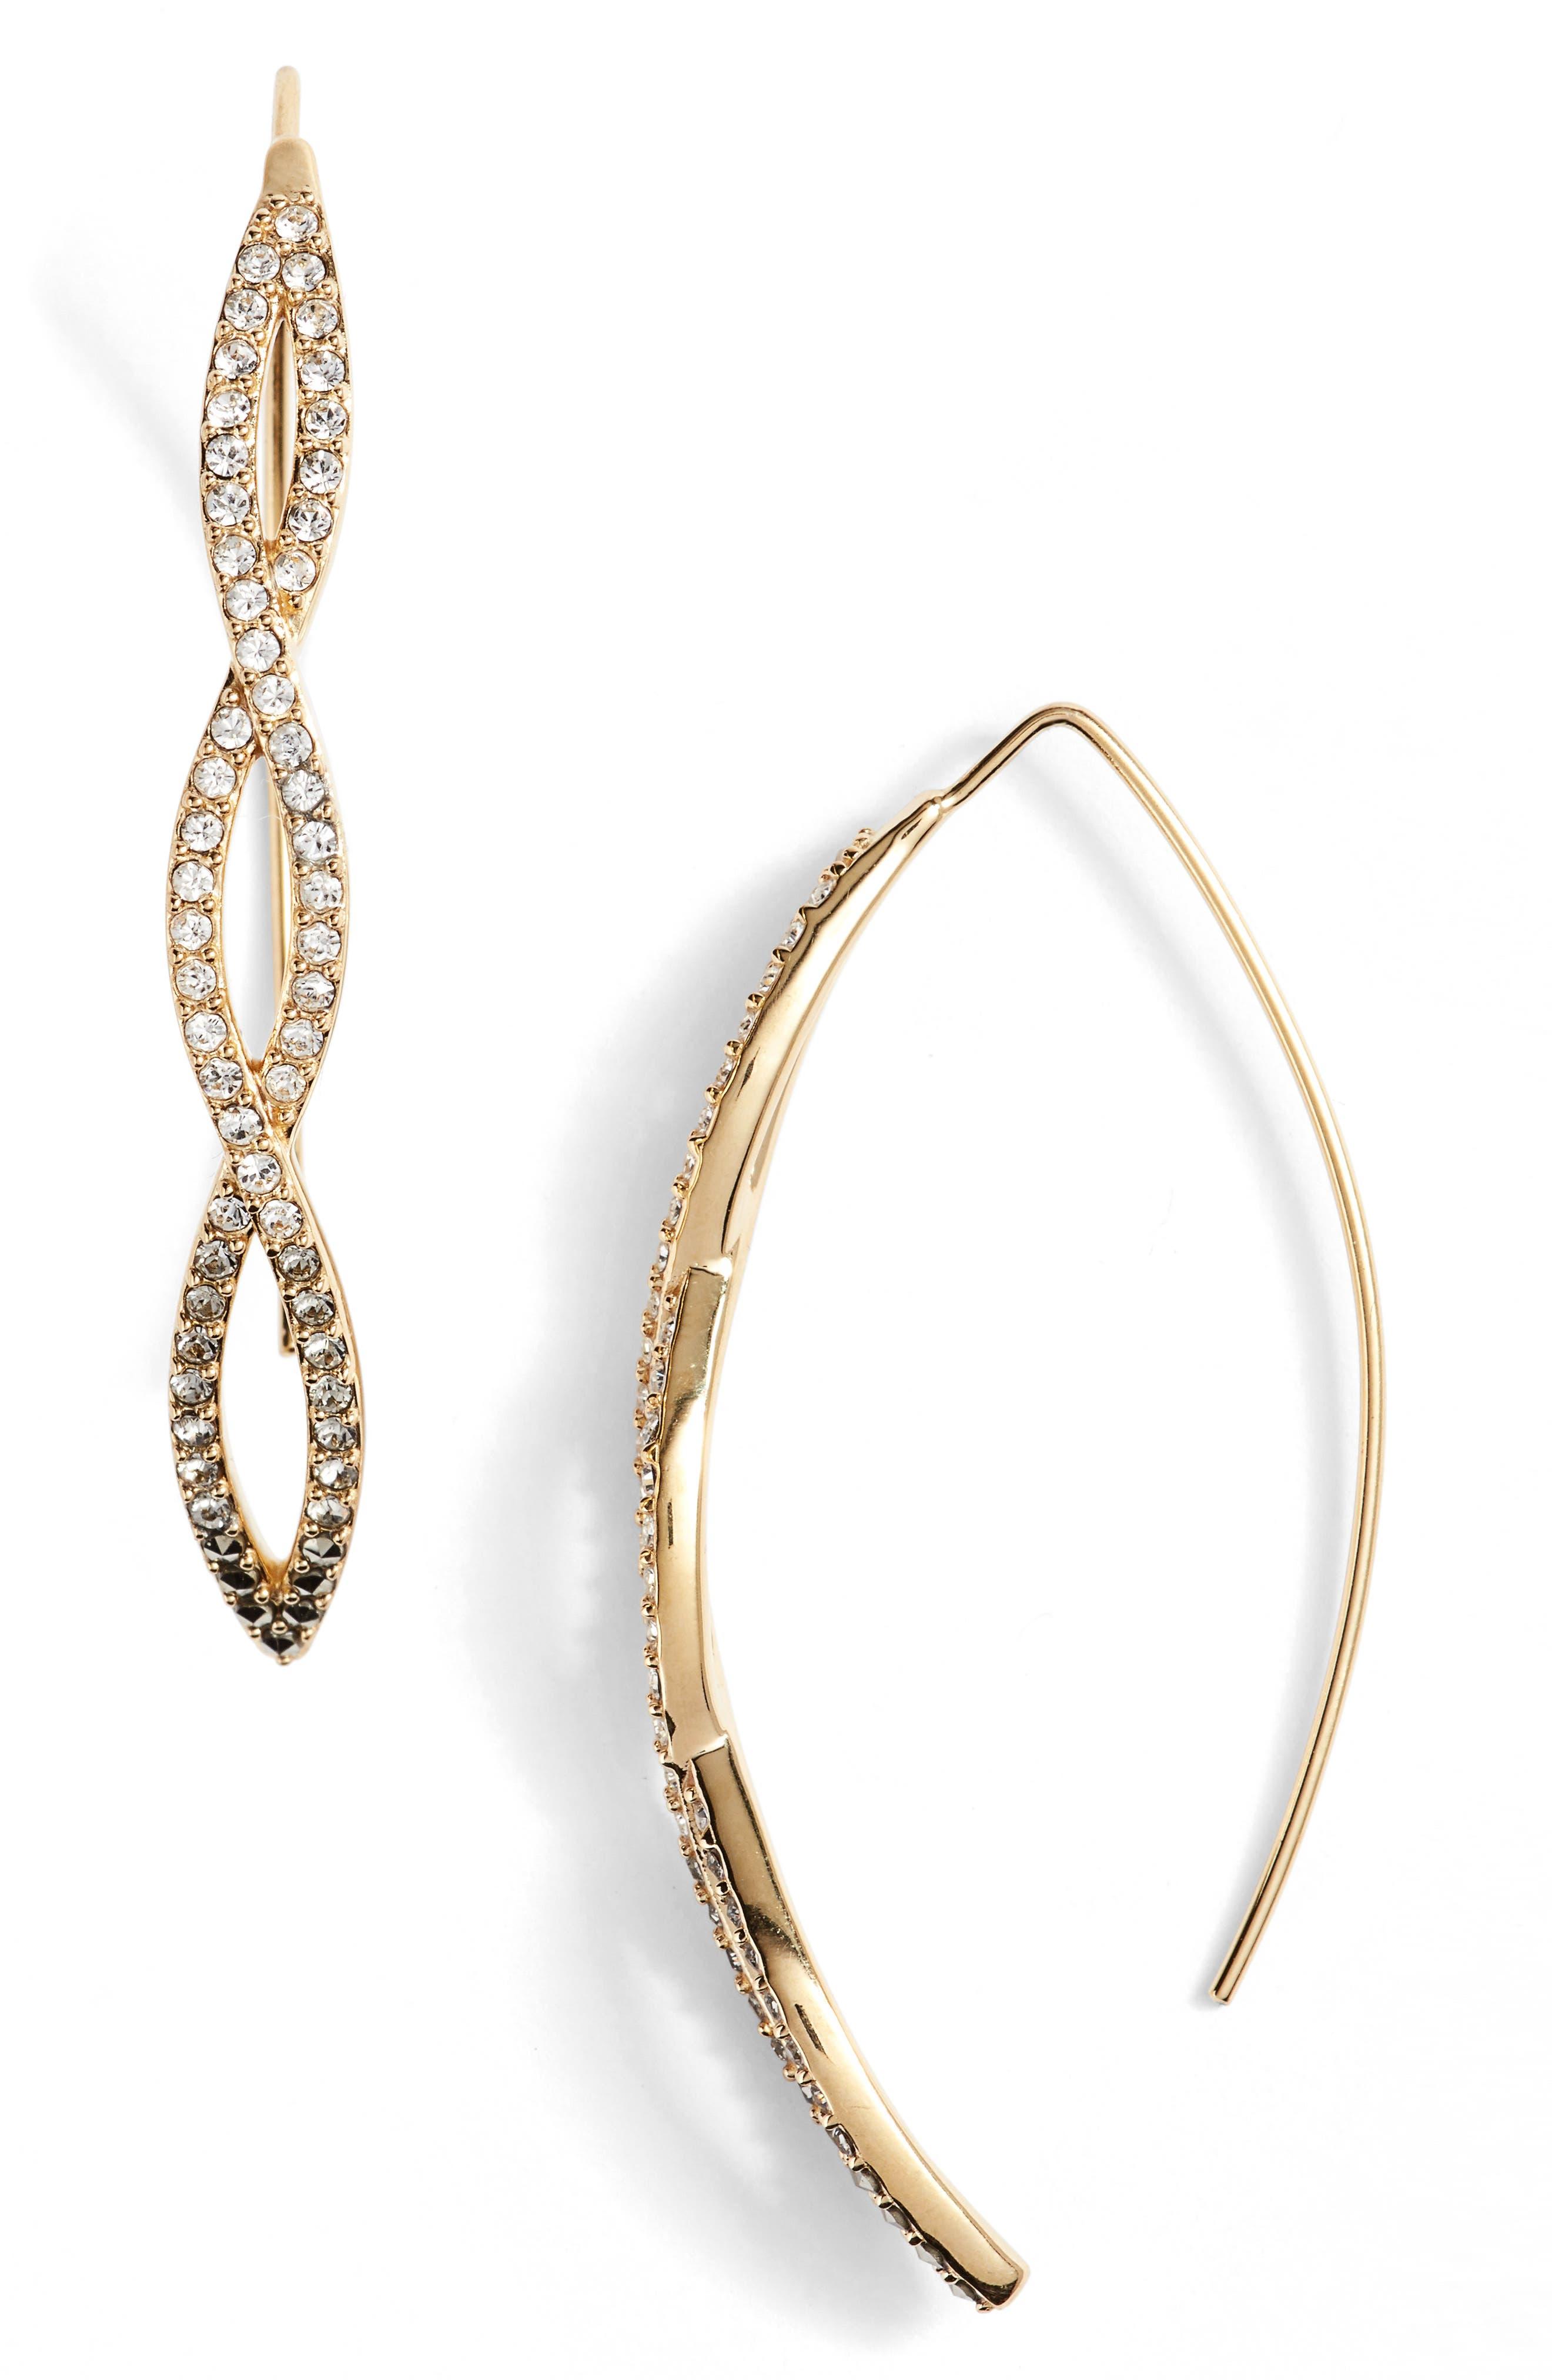 JUDITH JACK Crsytal Threader Earrings